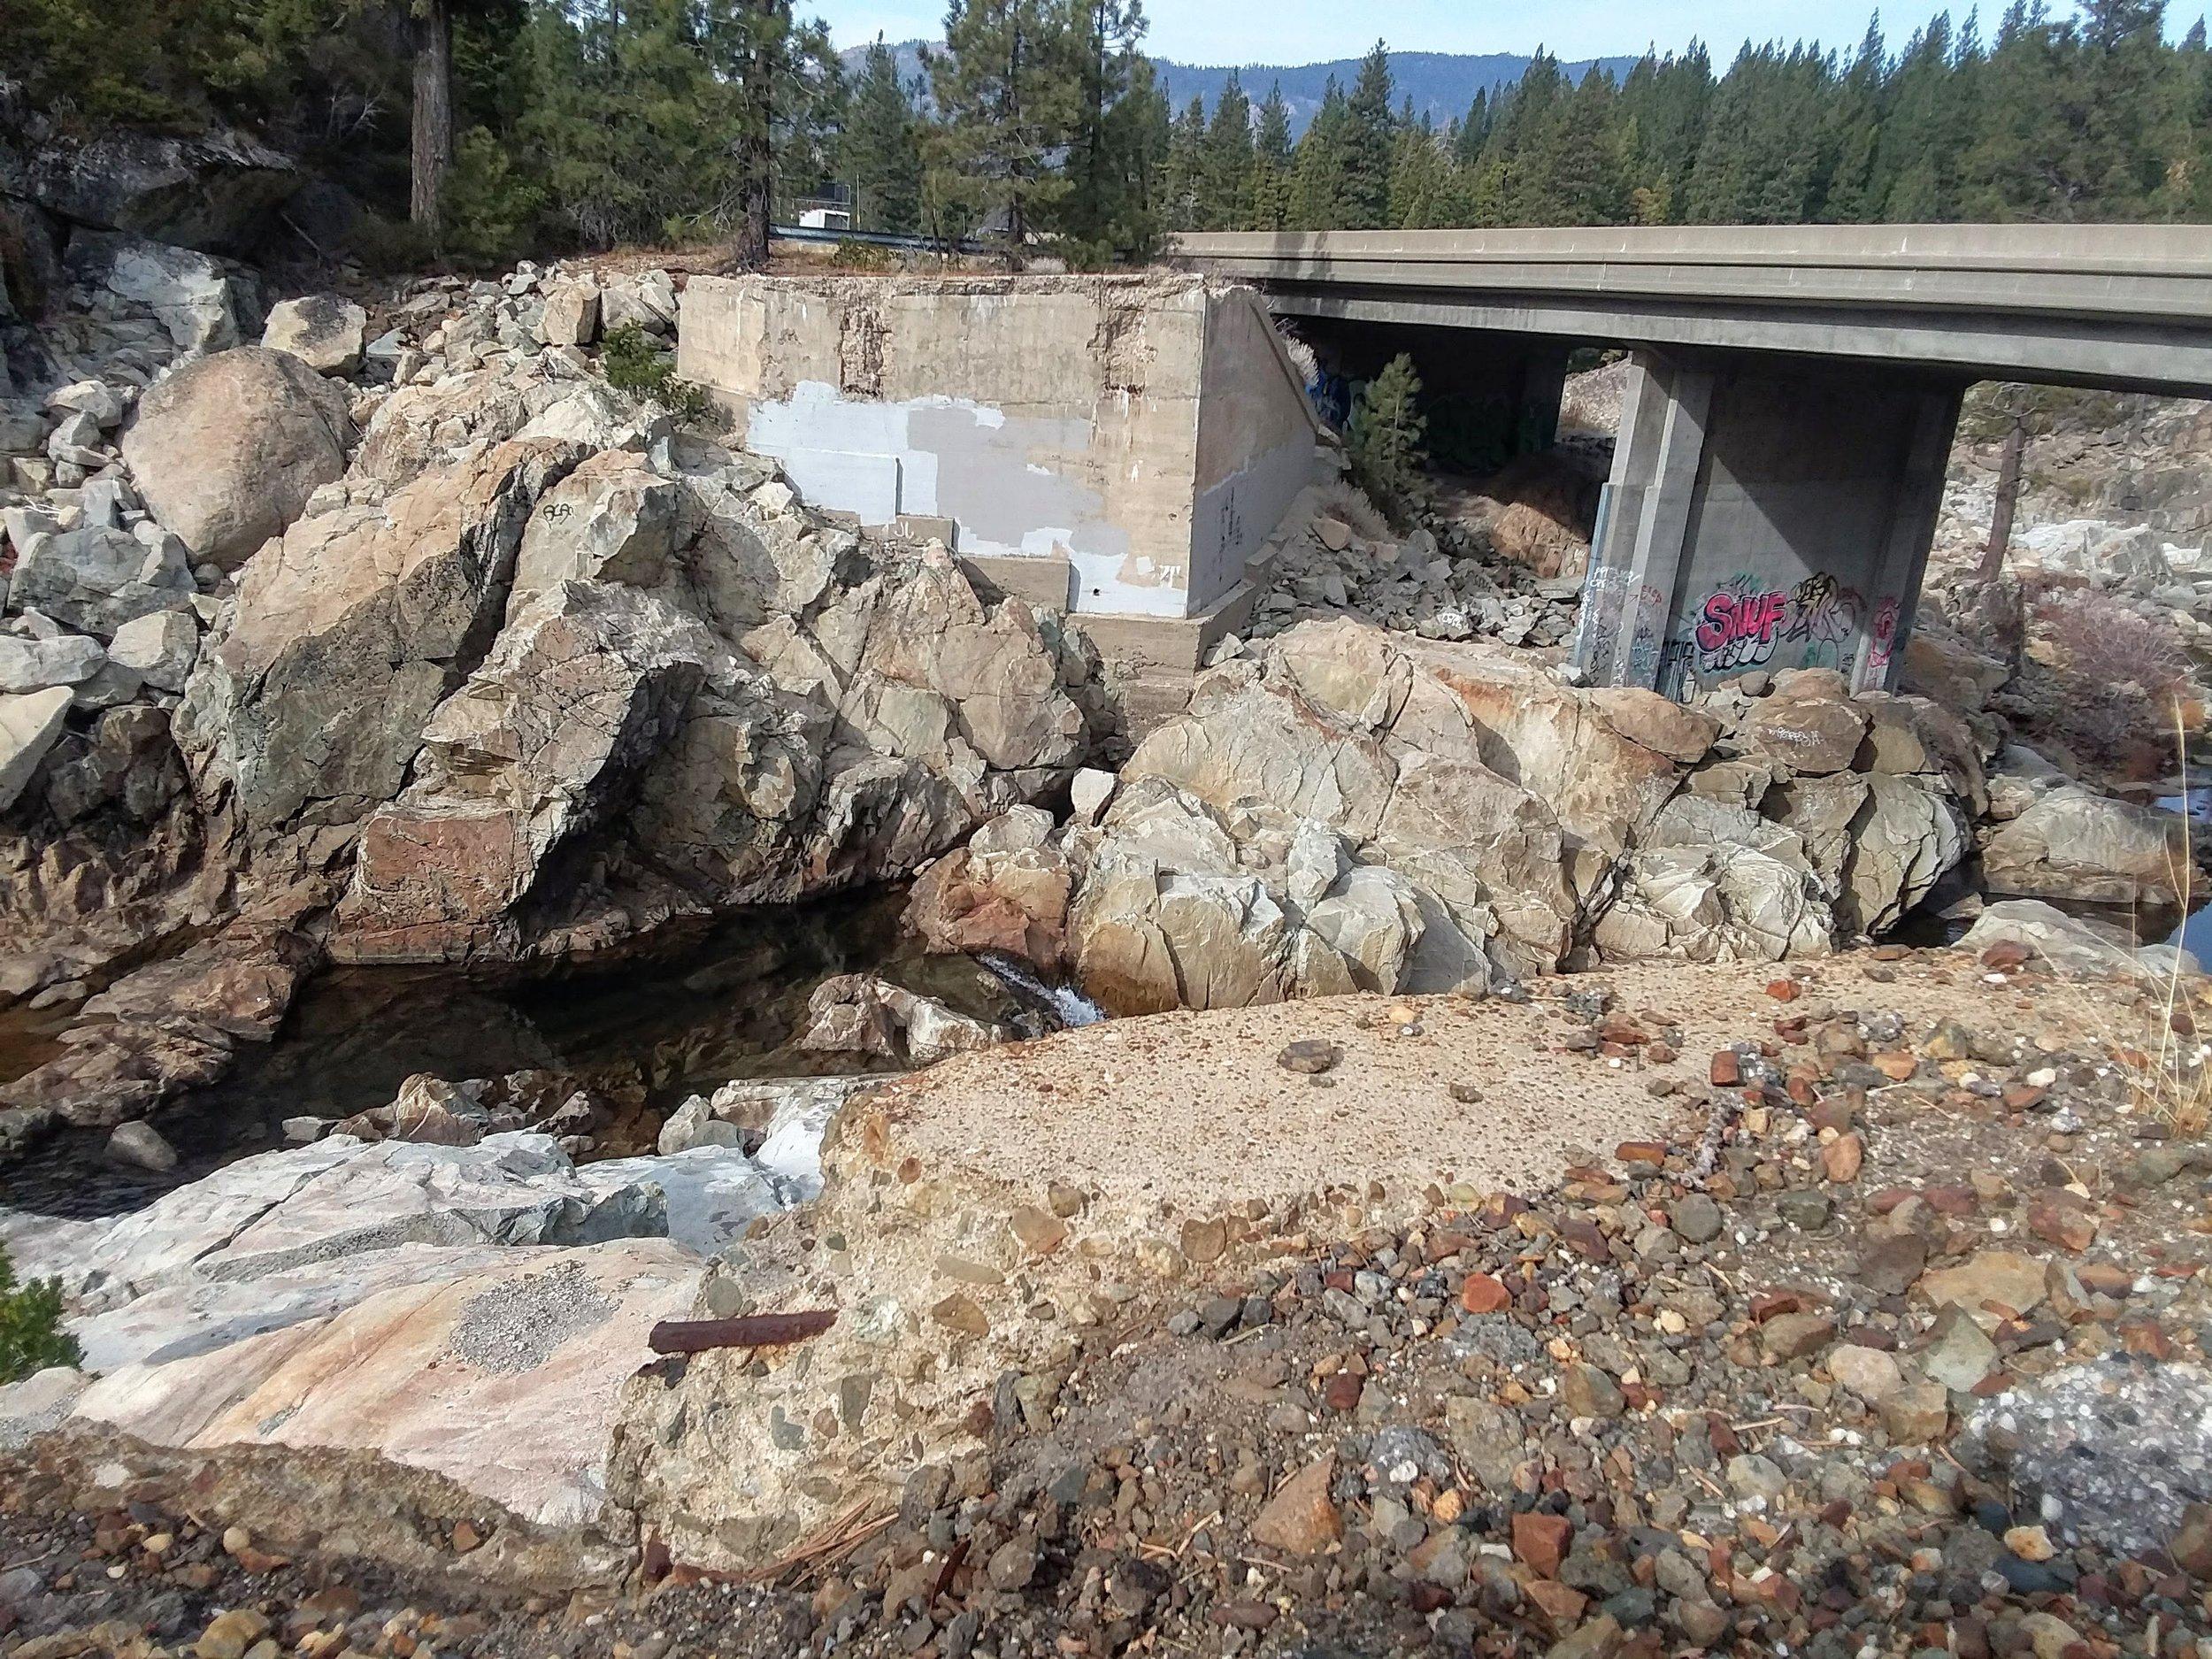 Old site of Highway 40 bridge, with present day Interstate 80 bridge, westbound lanes behind.